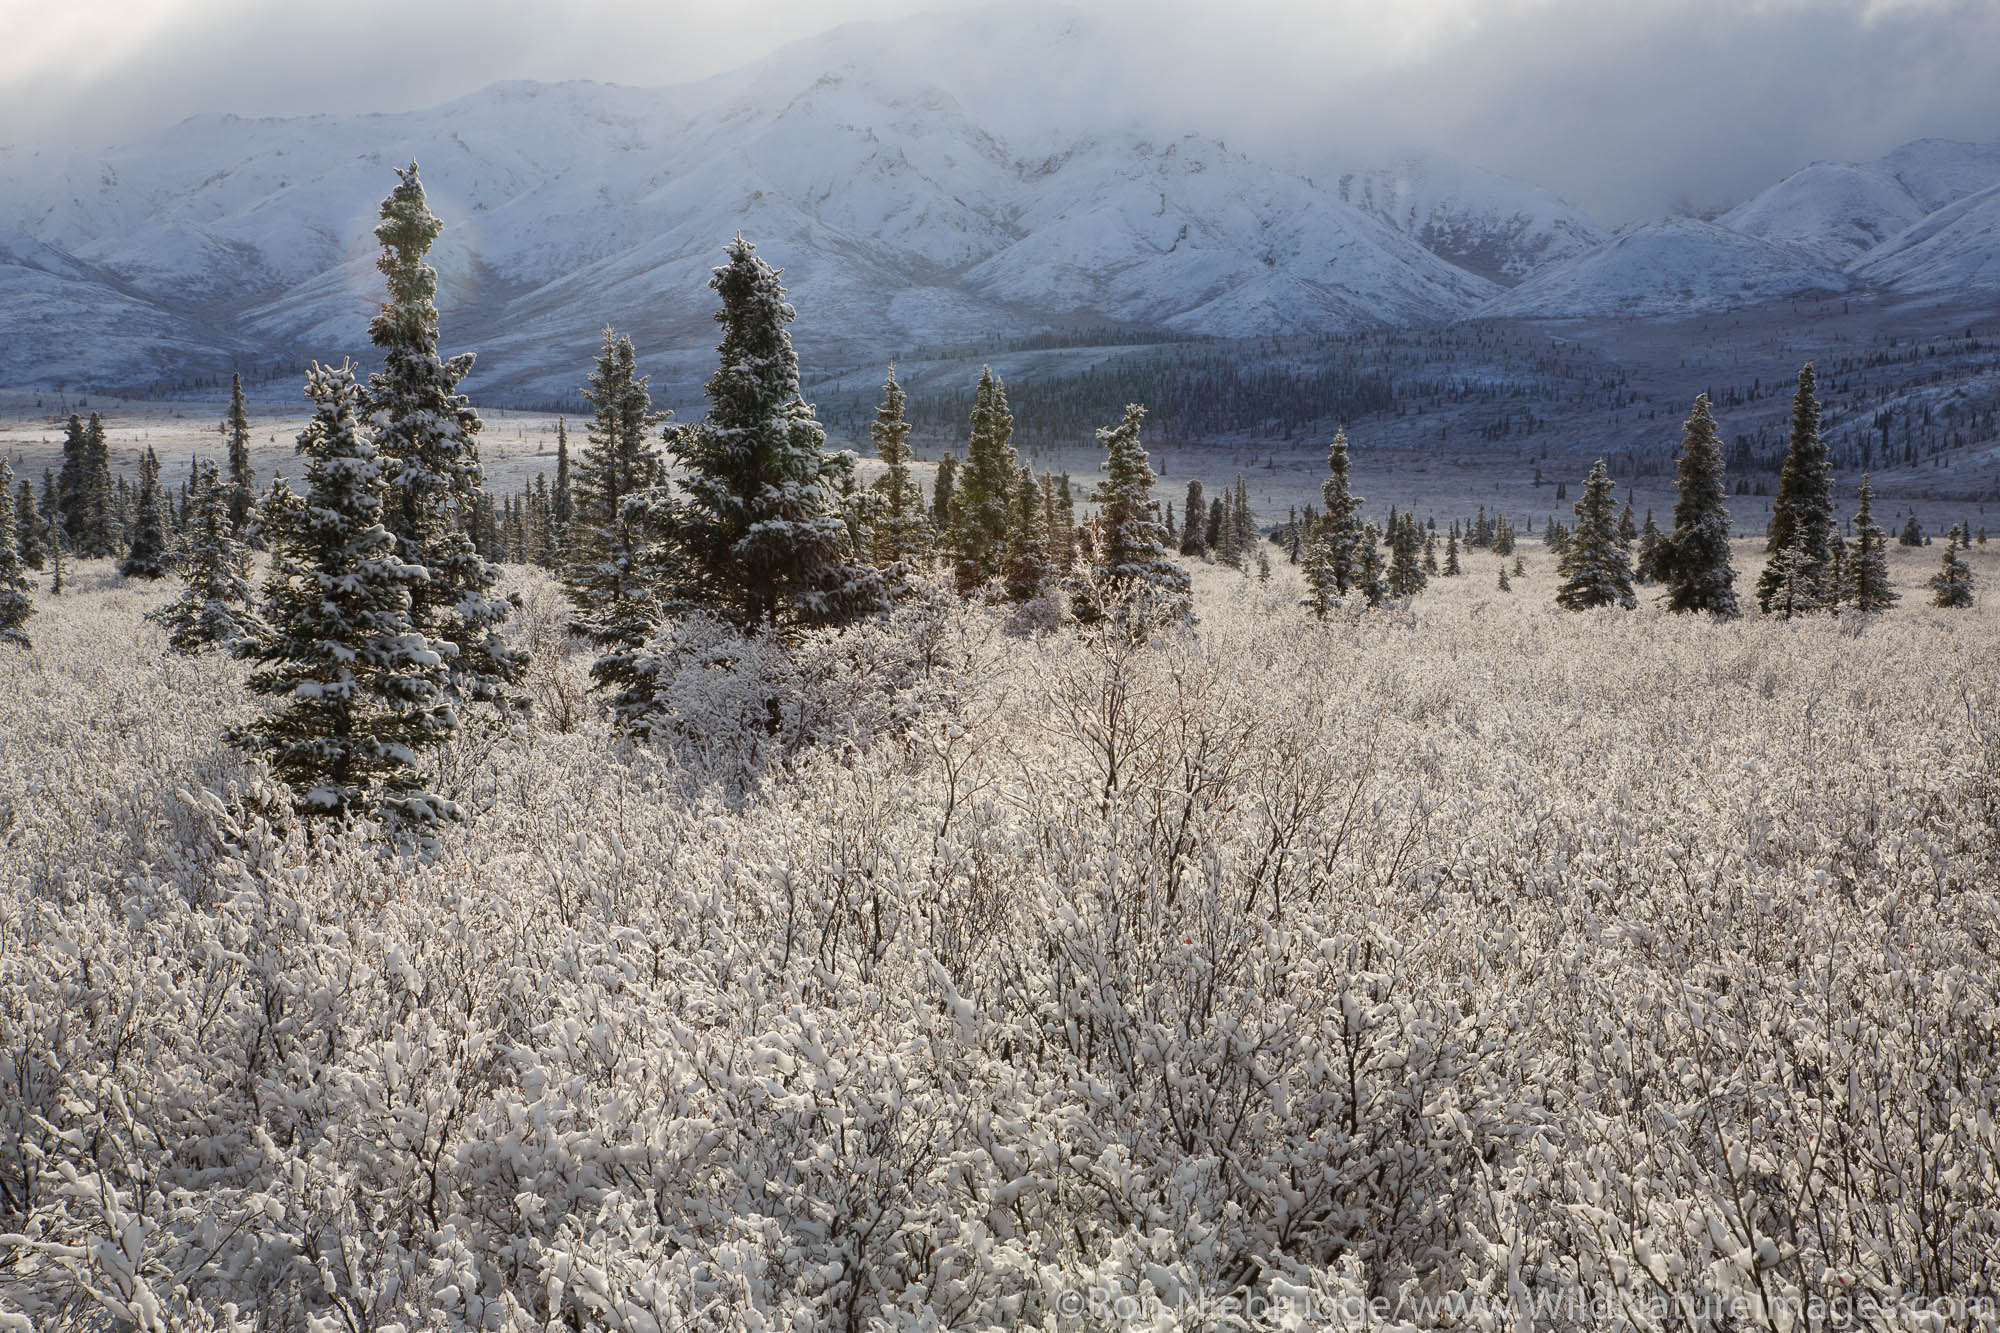 Winter in Denali National Park, Alaska.